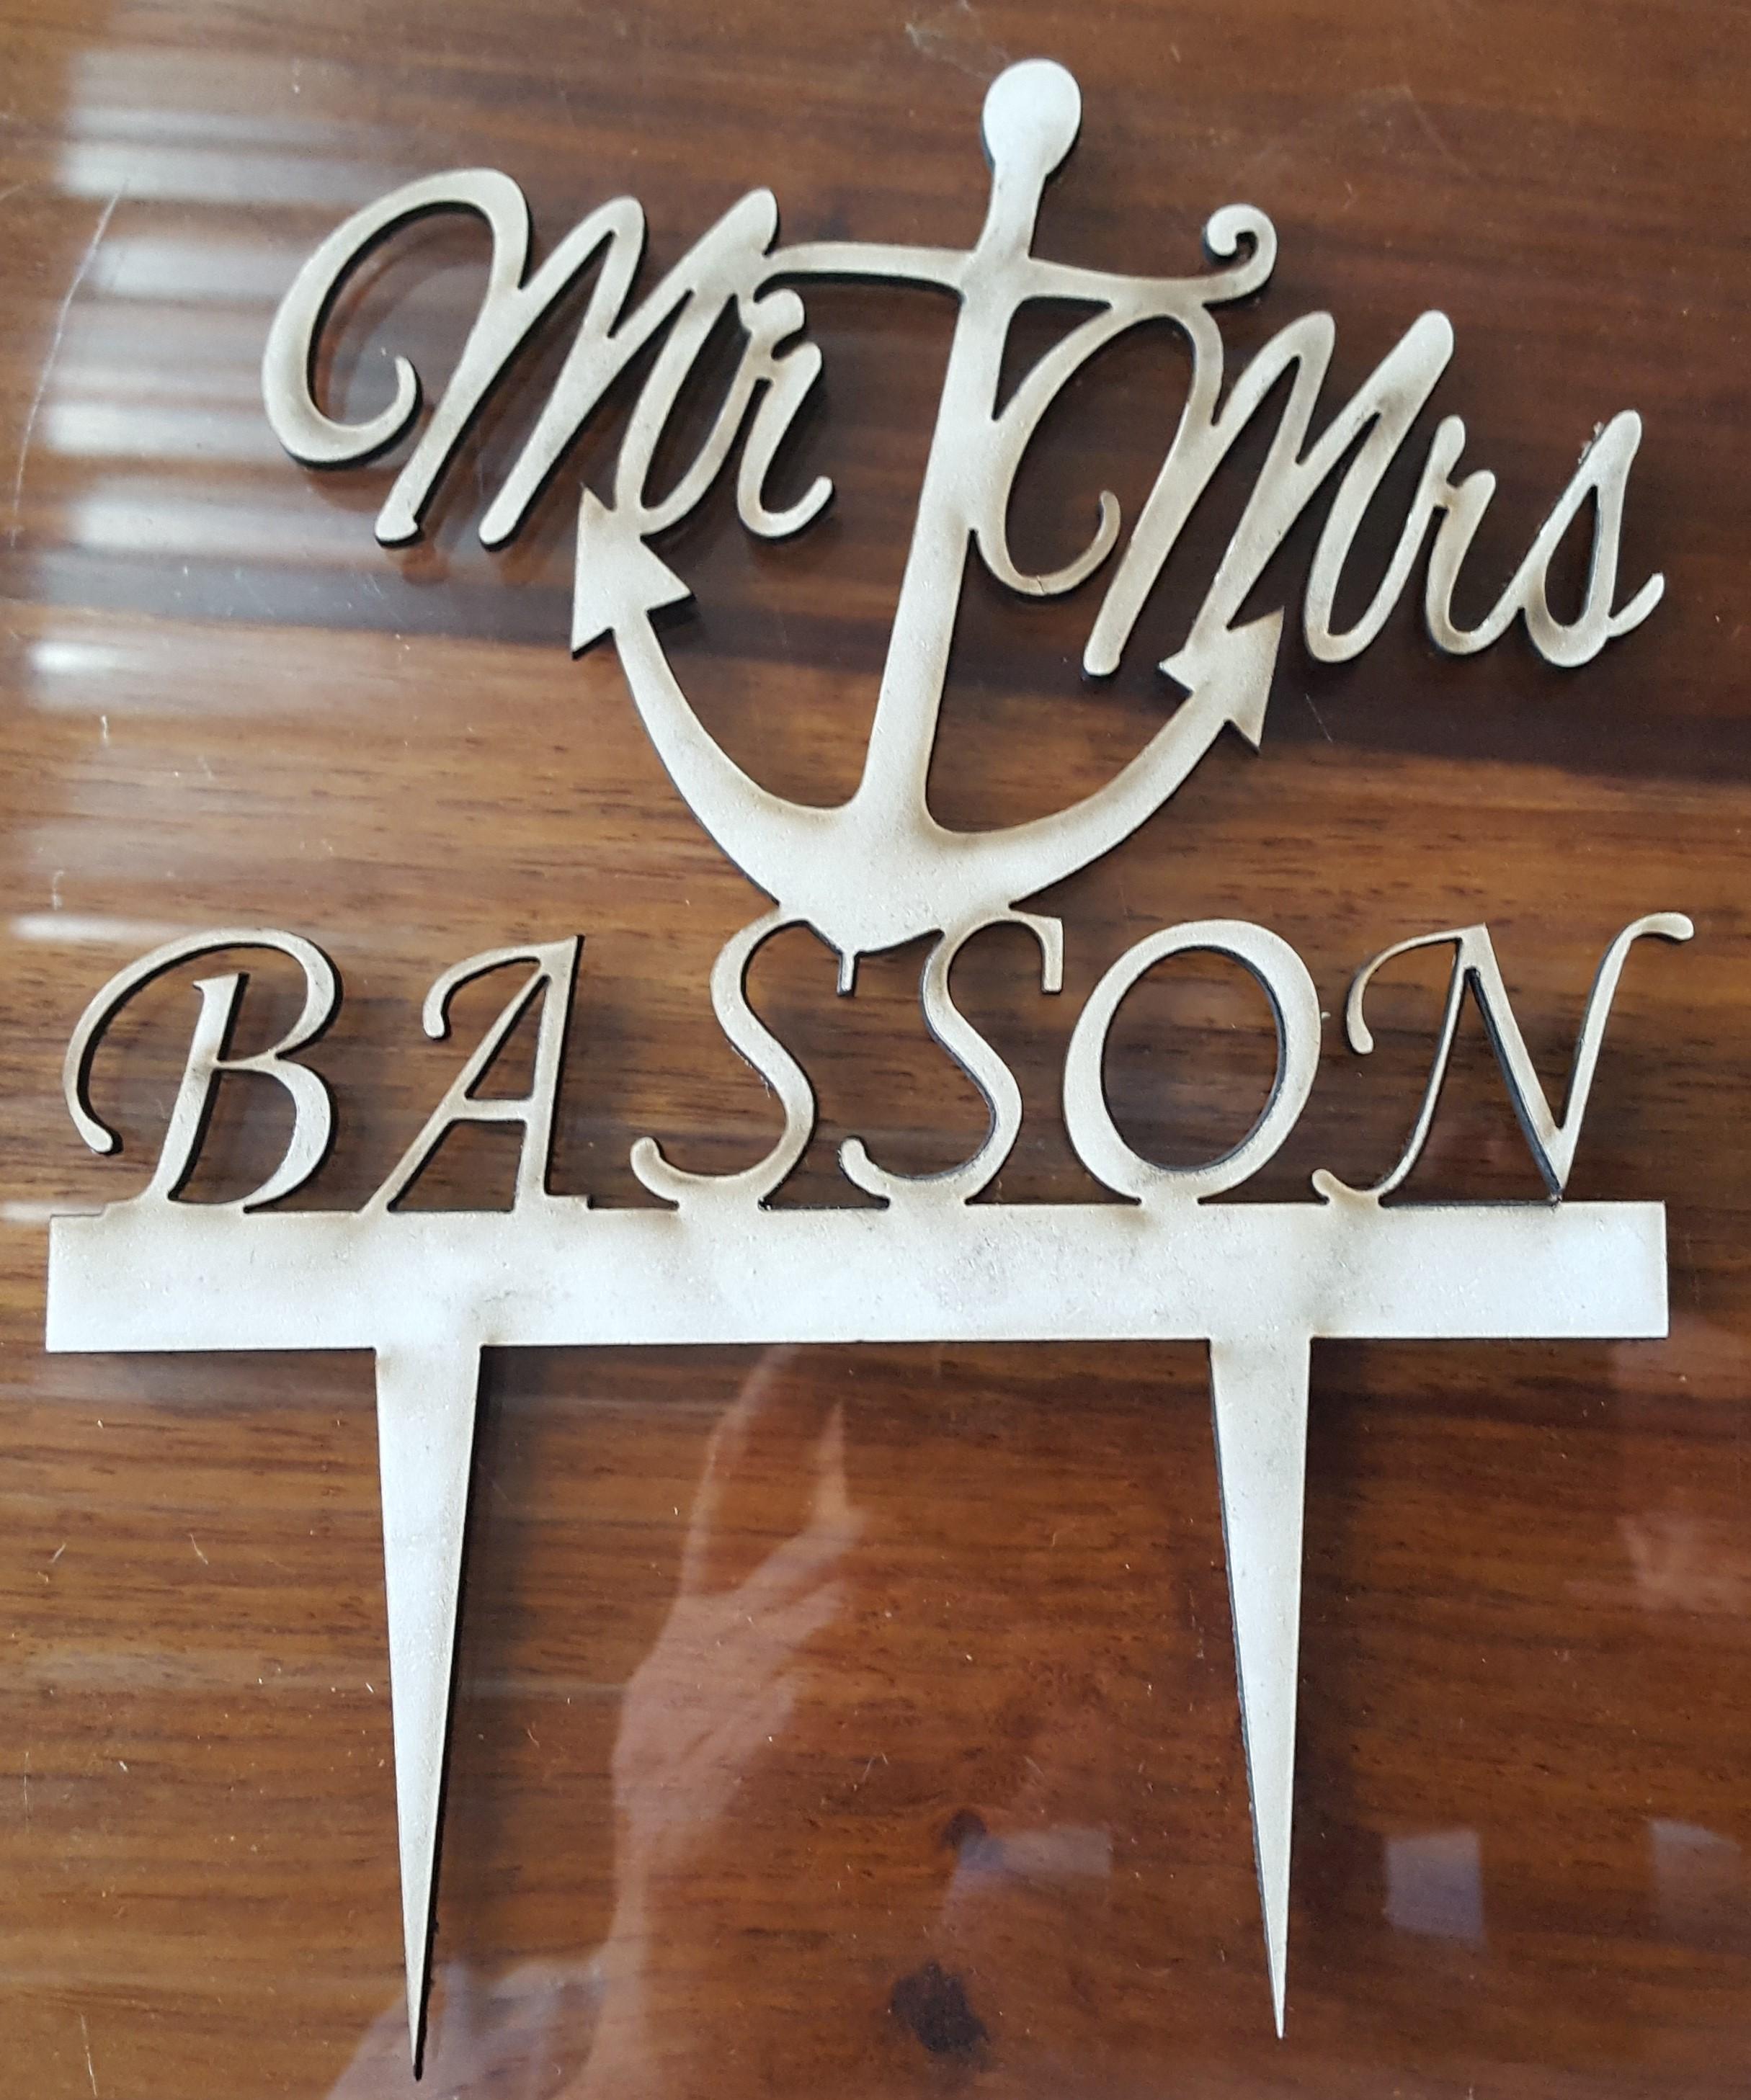 BASSON 1.jpg